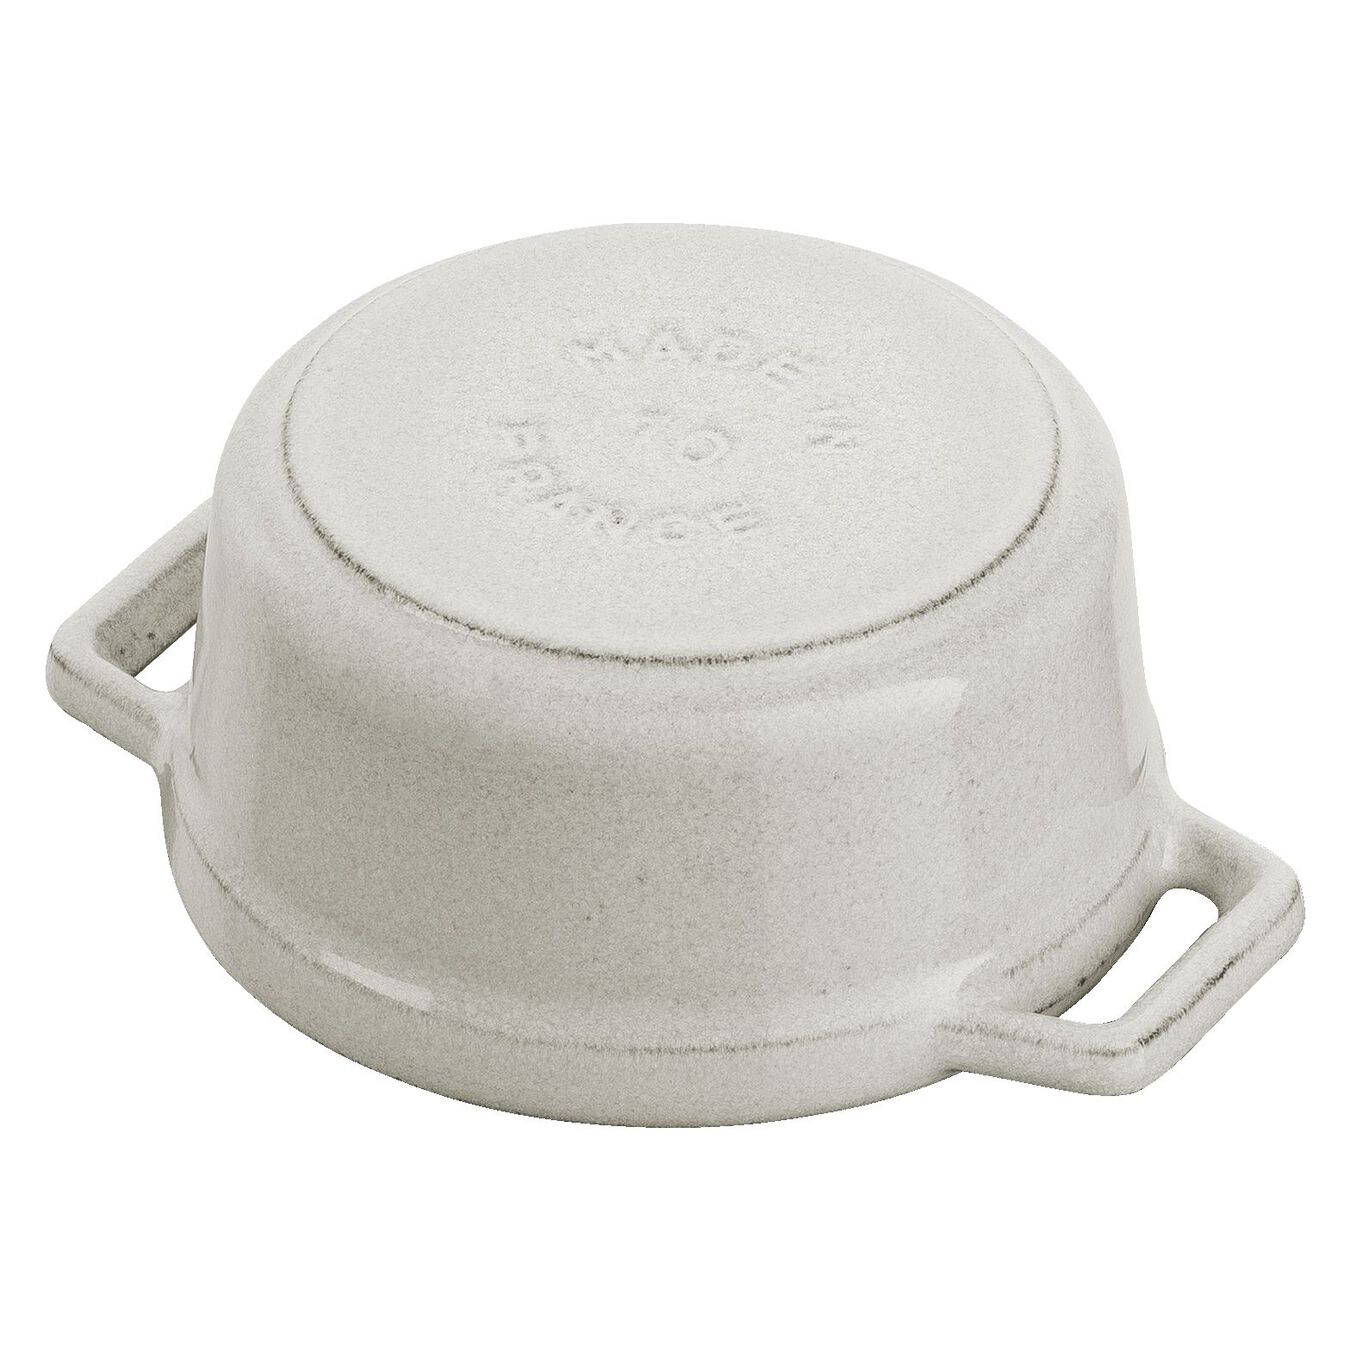 Mini Cocotte 10 cm, Rond(e), White Truffle, Fonte,,large 4